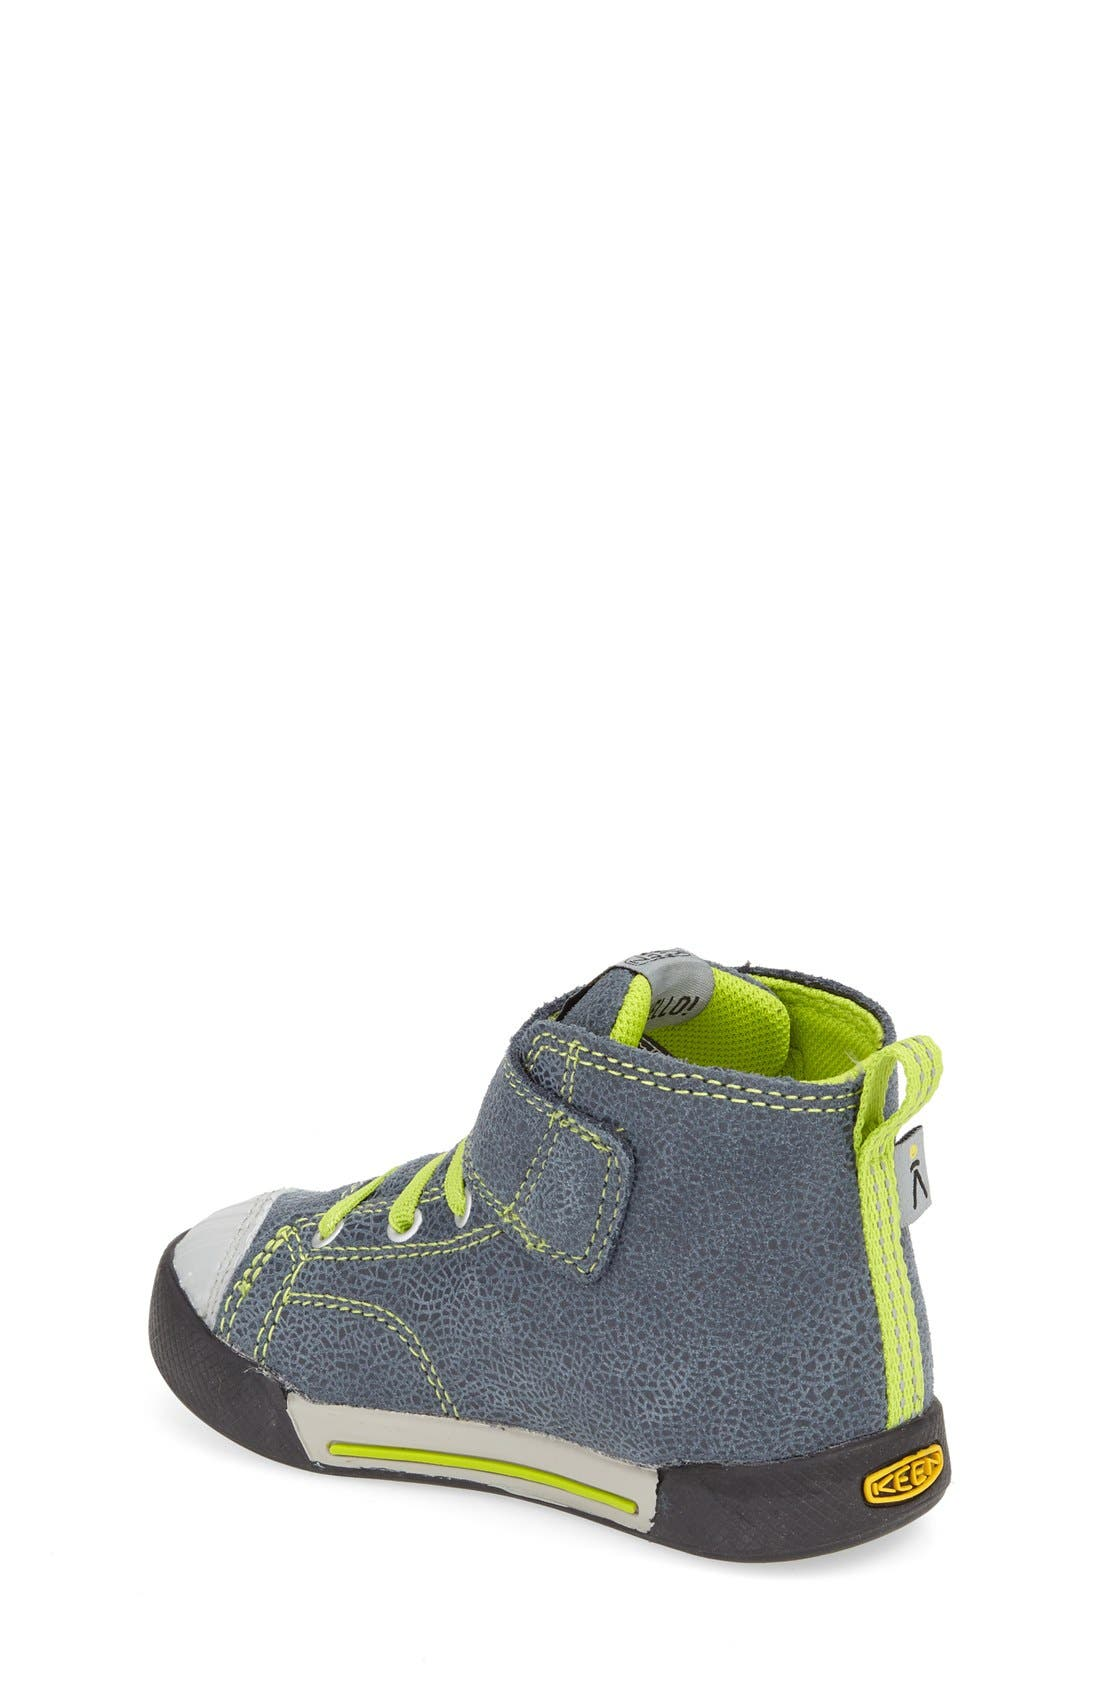 'Encanto Scout' High Top Sneaker,                             Alternate thumbnail 2, color,                             001